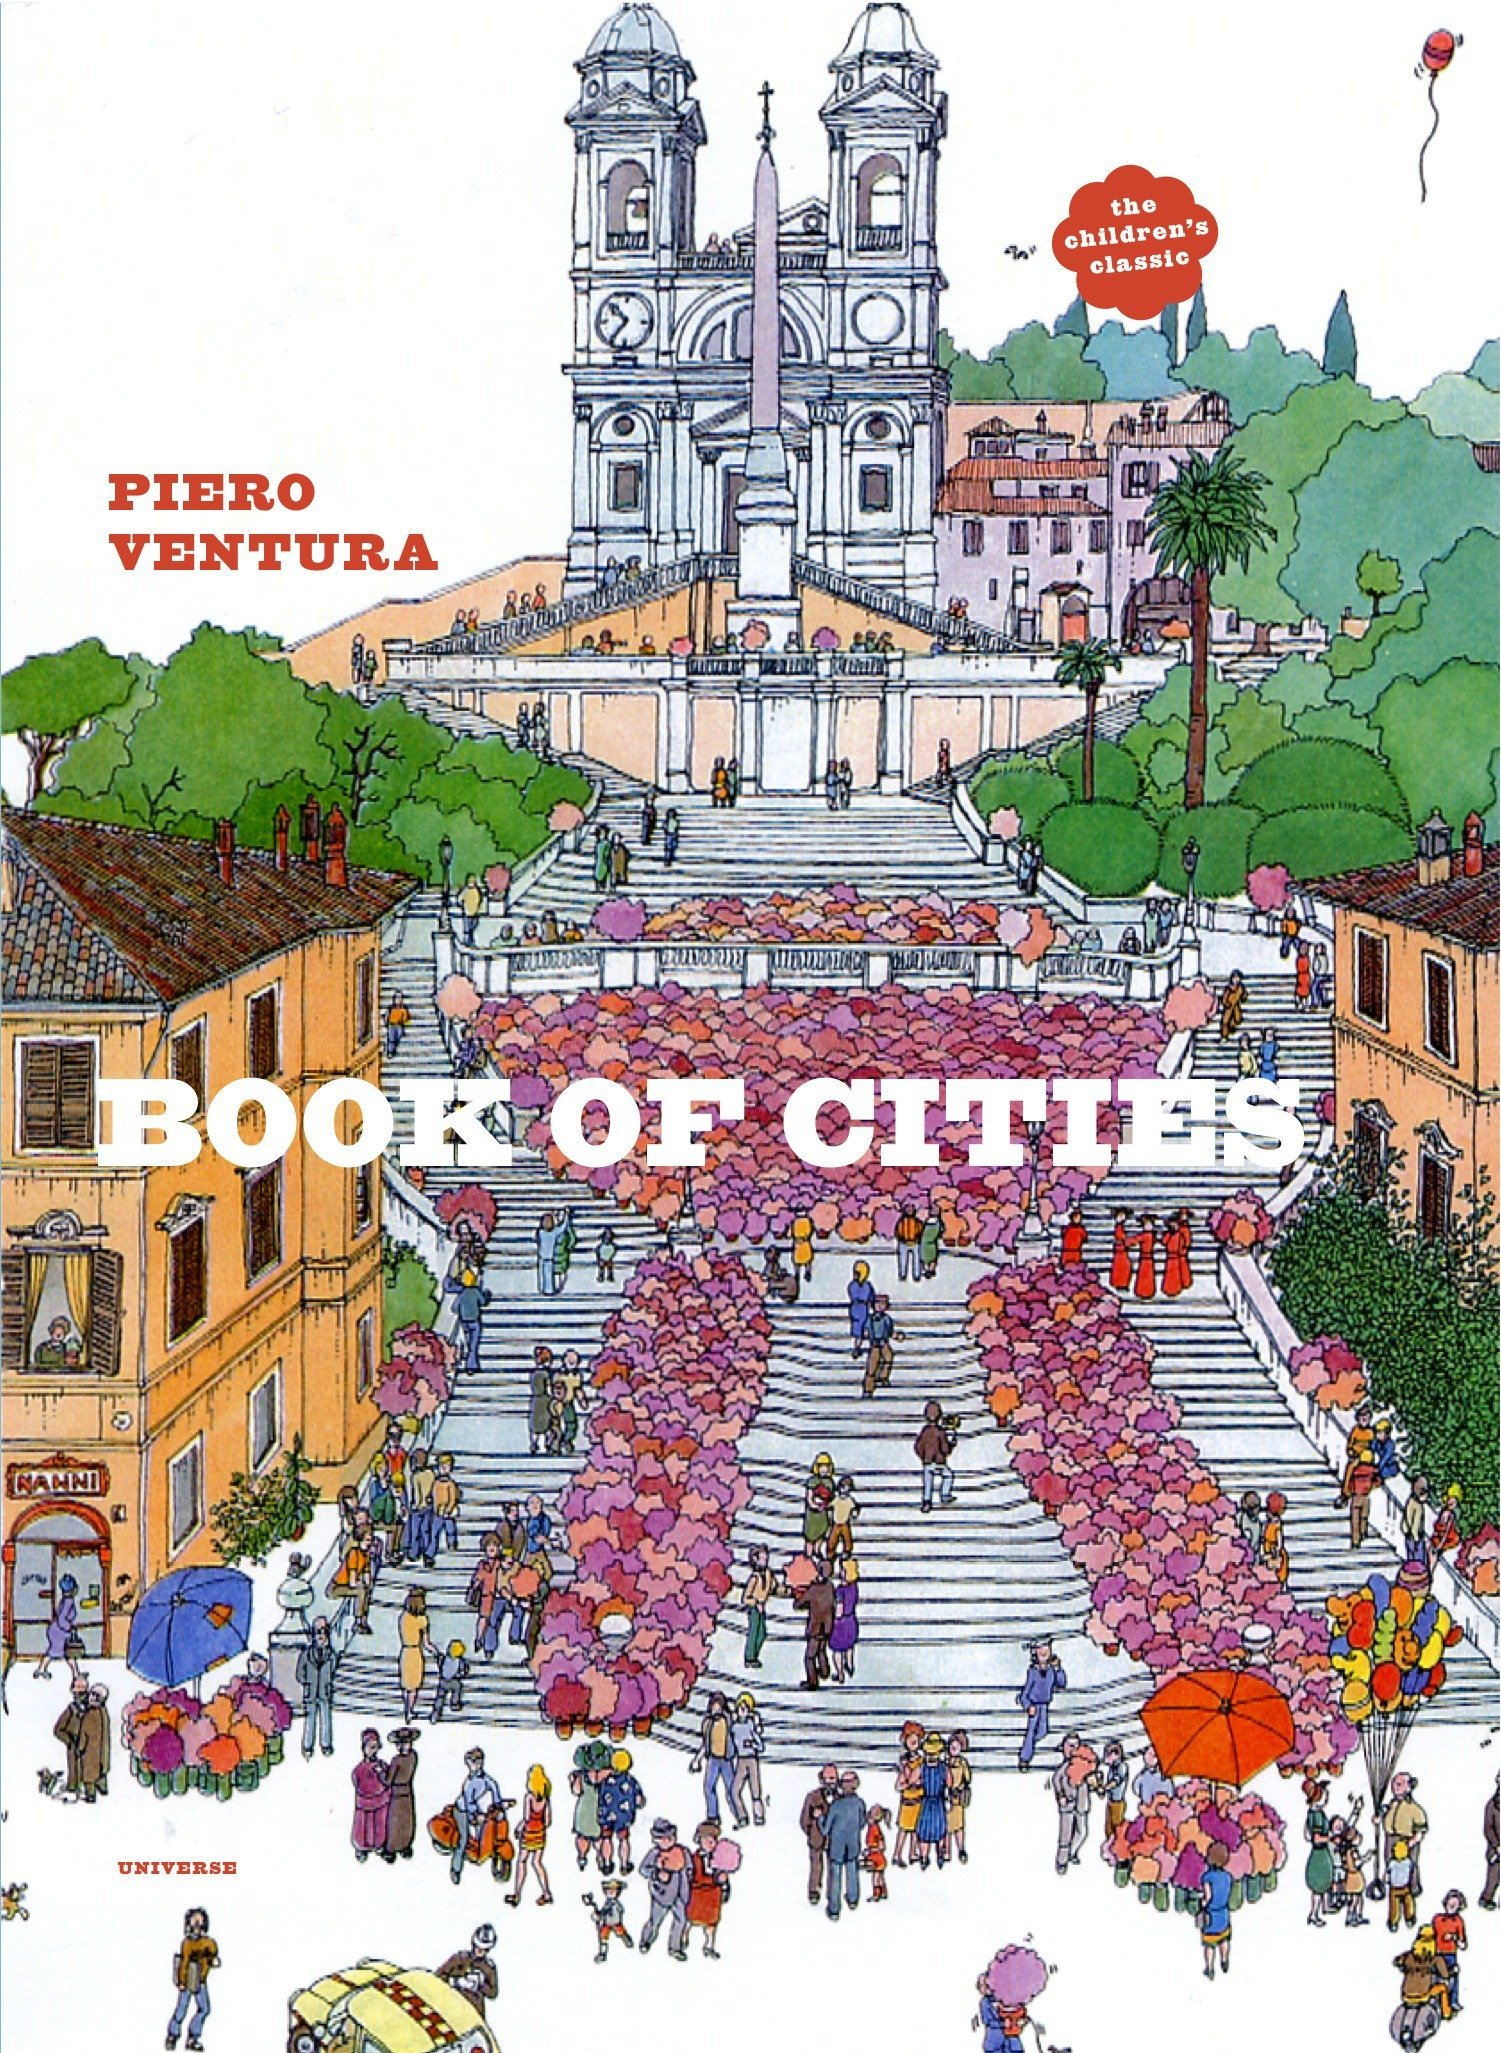 Book of Cities: Ventura, Piero: 9780789318213: Amazon.com: Books